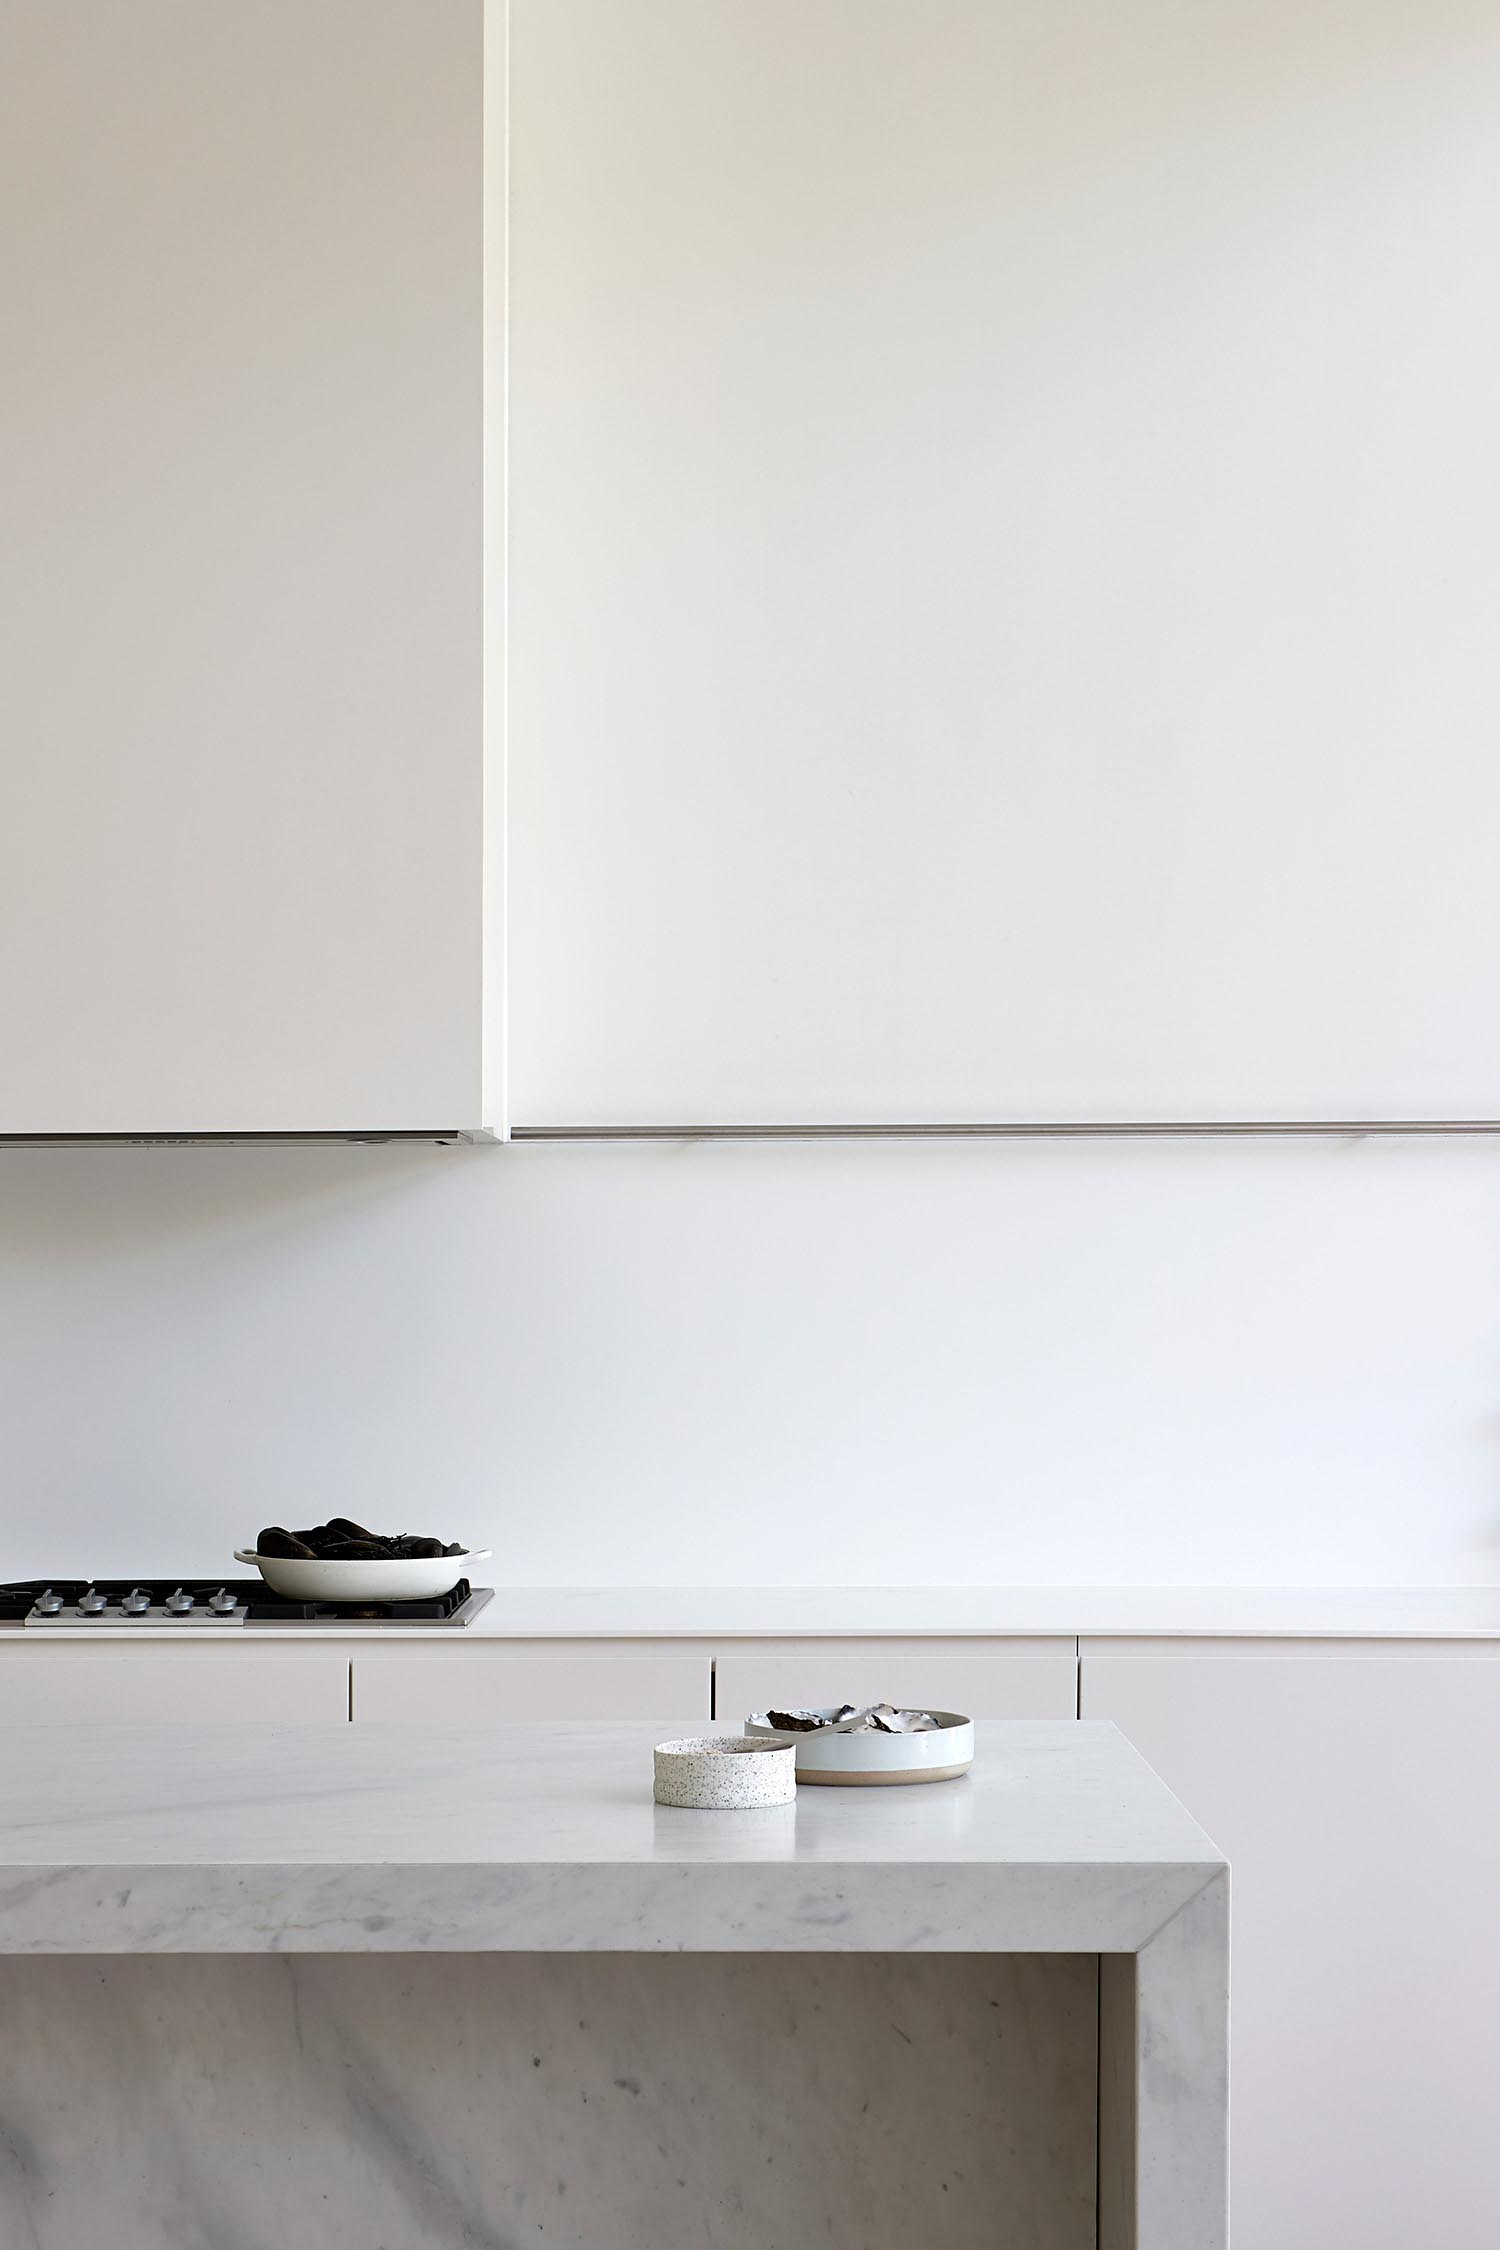 A modern white kitchen with an island.